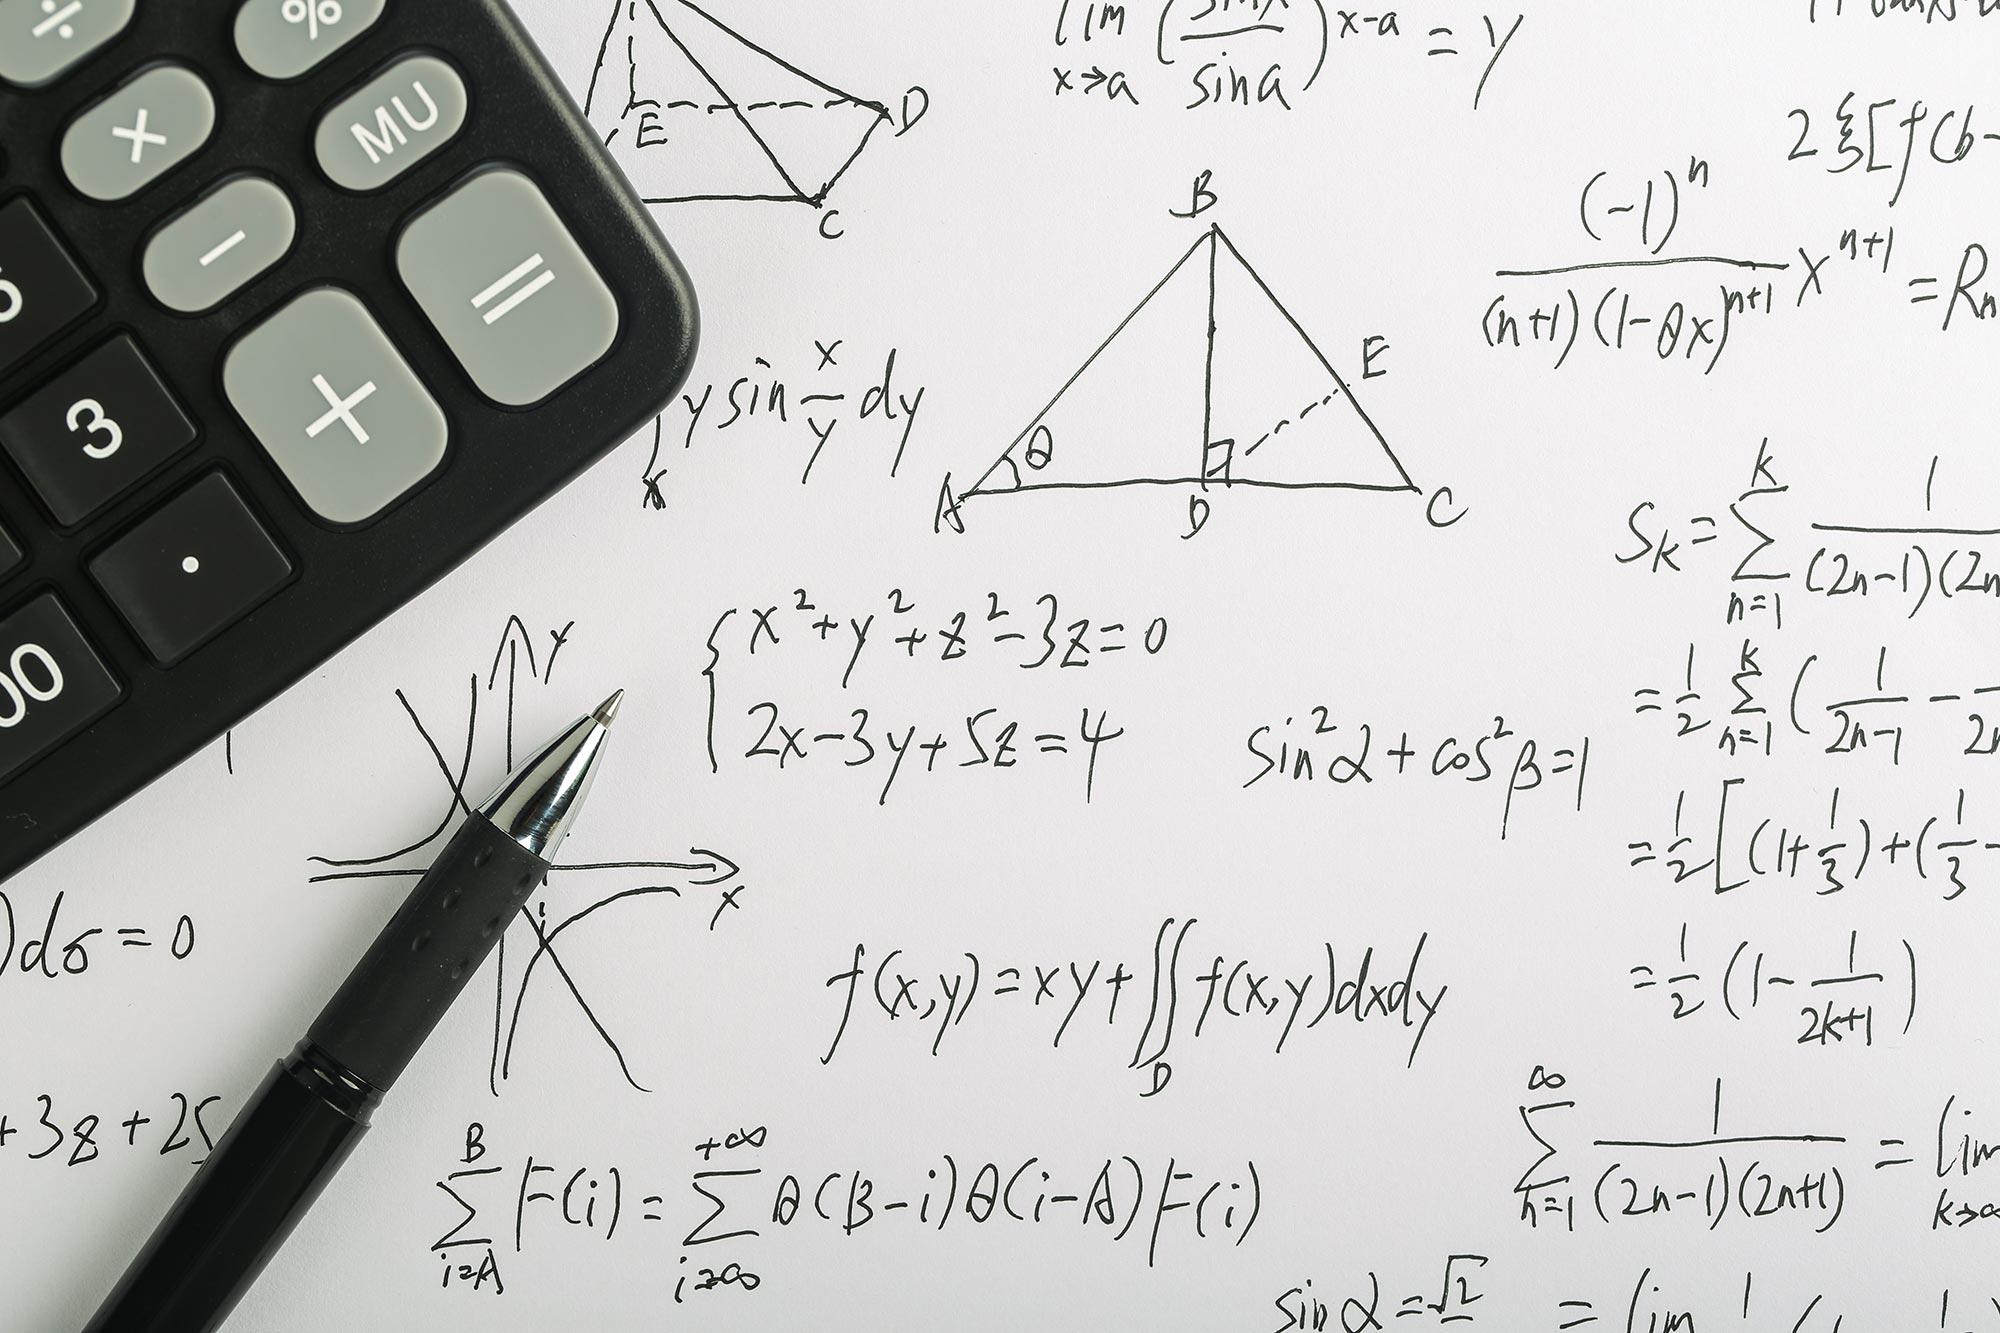 COVID 19 Math Model Concept - روش تست مجموعه دهم فصل اول